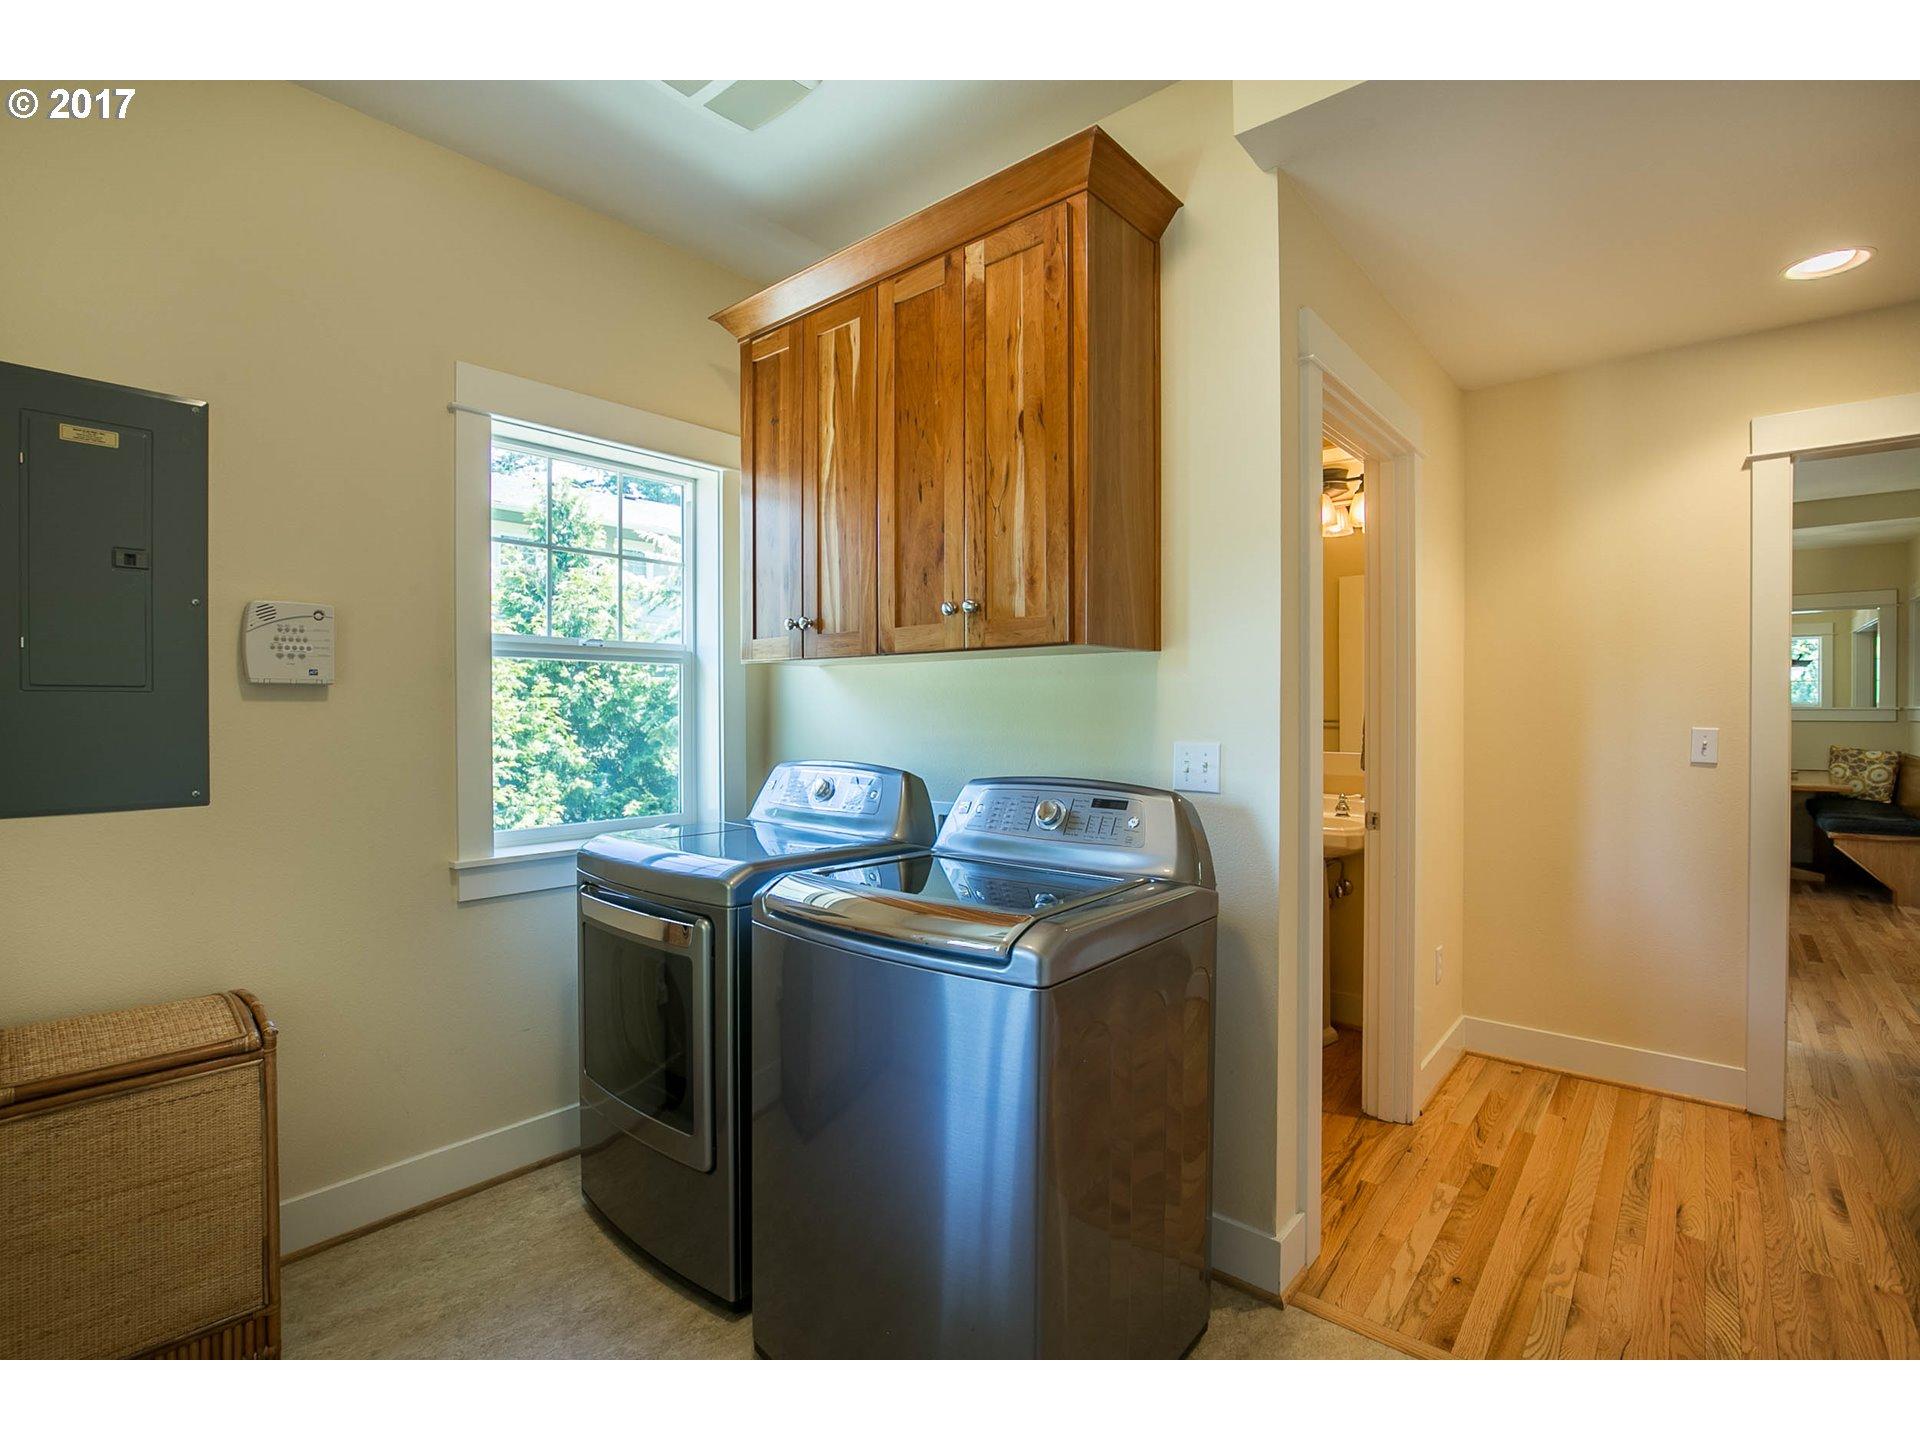 3771 SW VACUNA ST Portland, OR 97219 - MLS #: 17570765